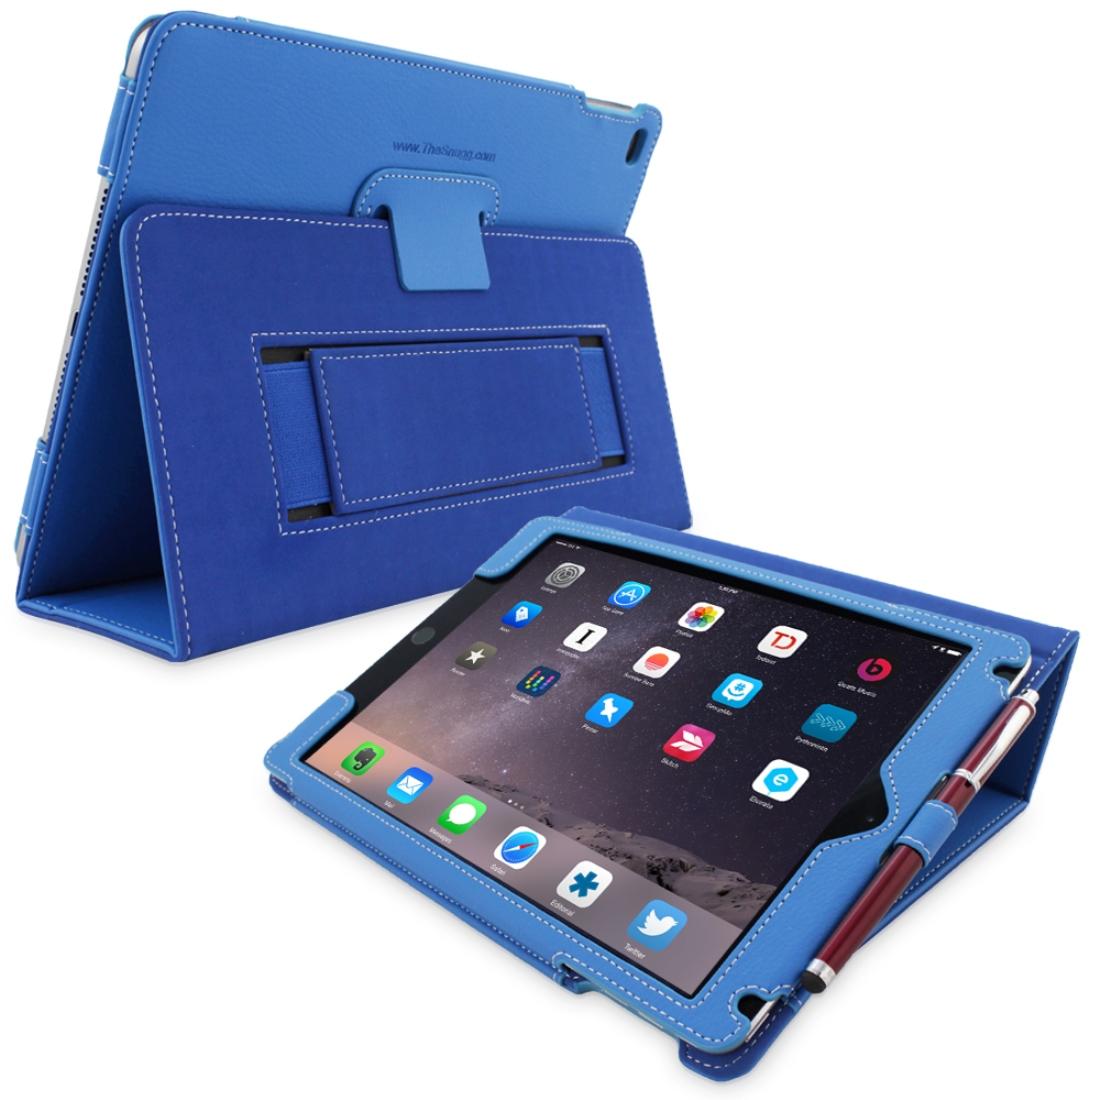 Snugg B00Q2YGFDO iPad Air 2 Card Slot Executive Case, Electric Blue Leather